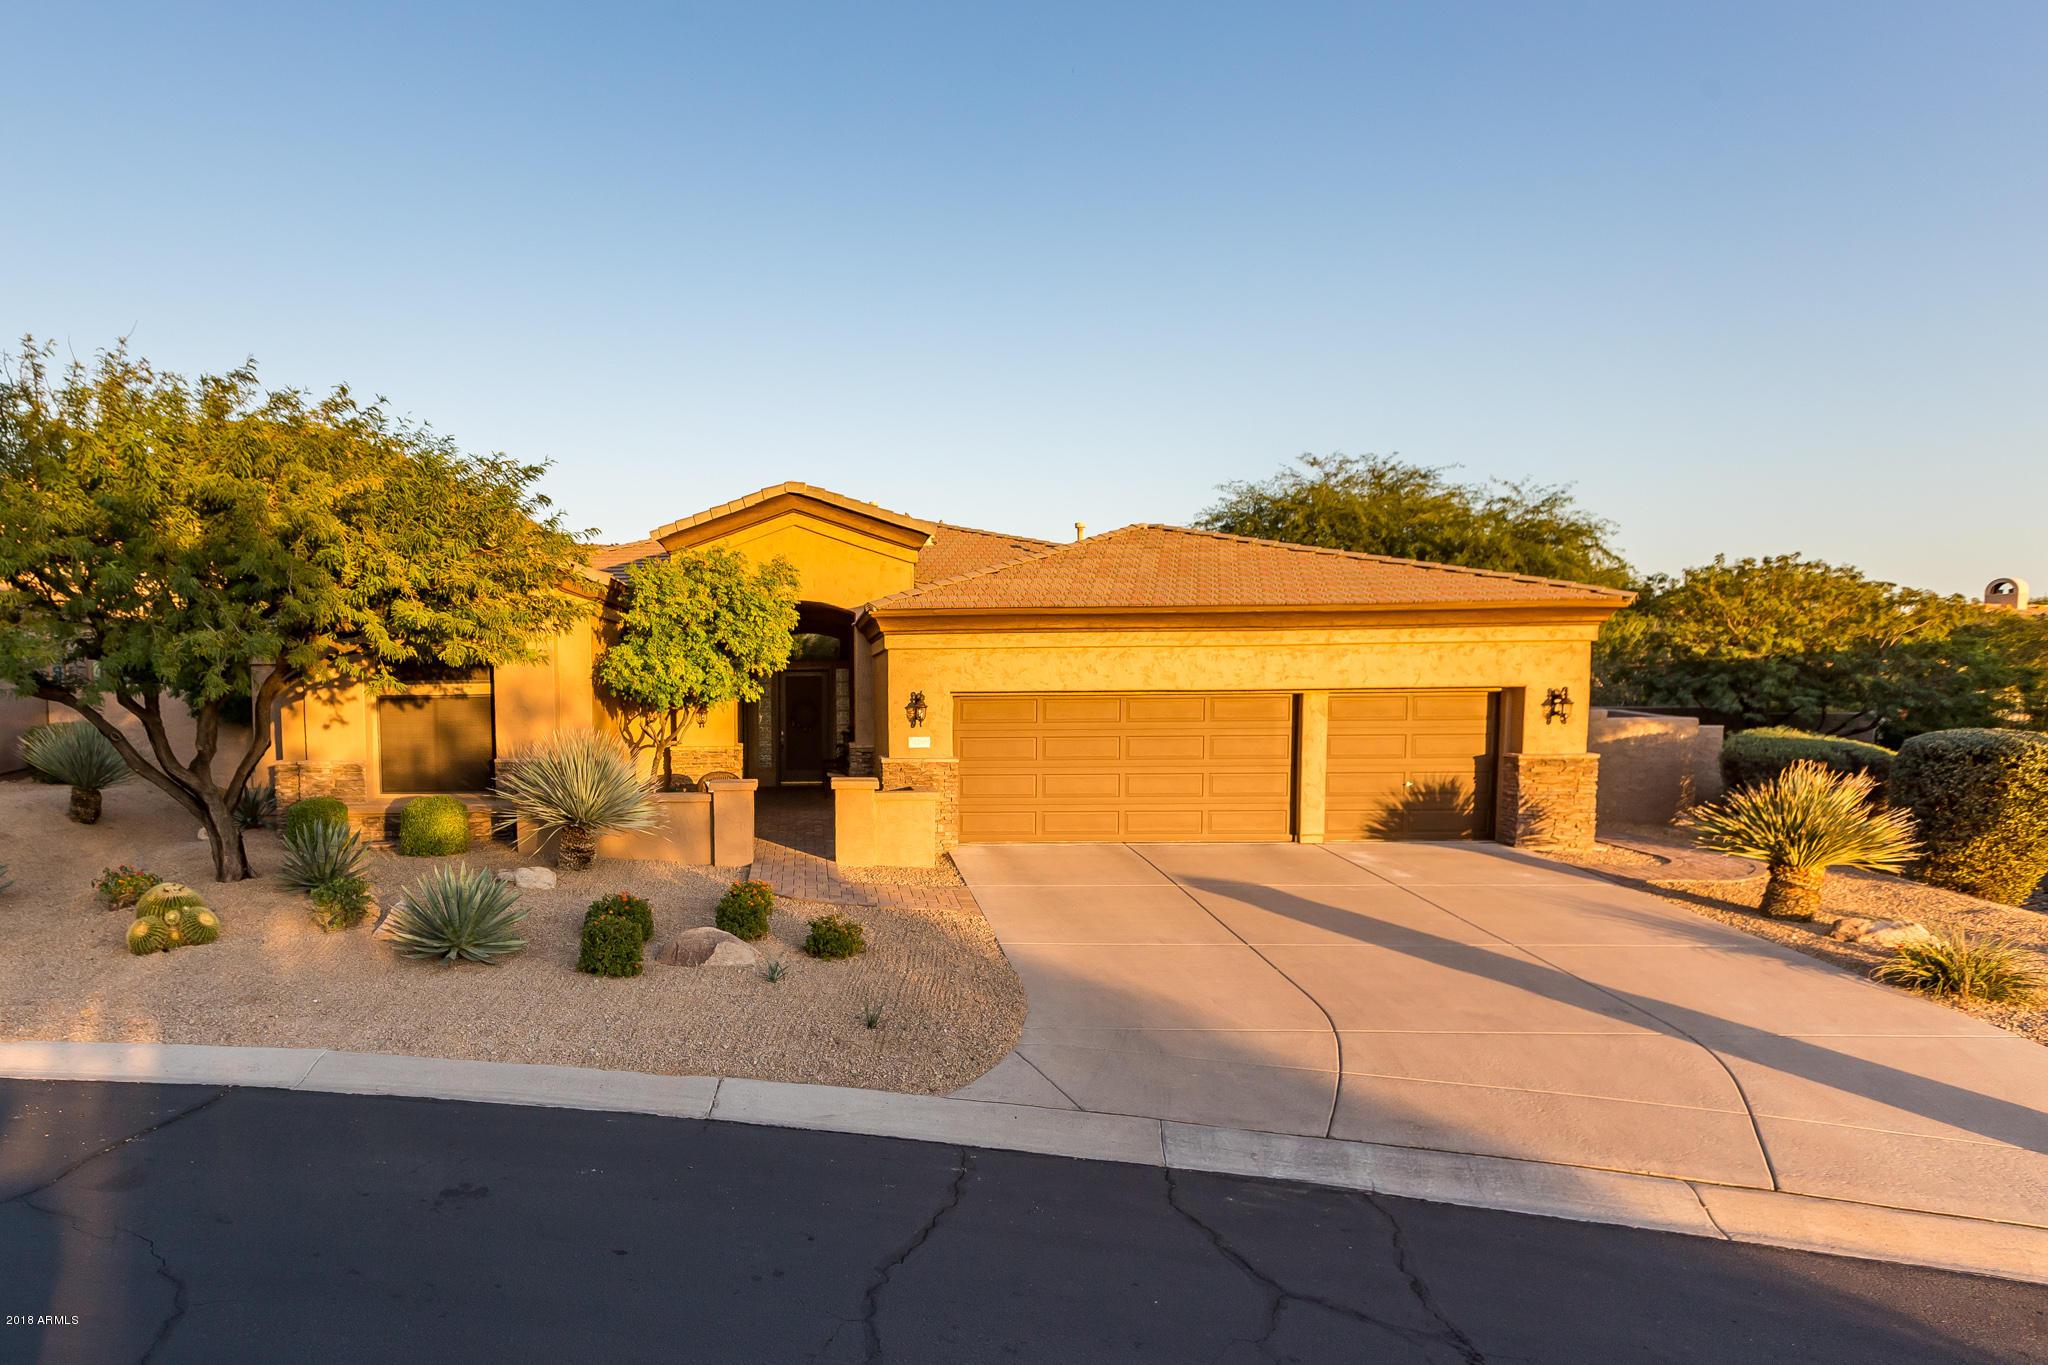 MLS 5857109 12819 N 114TH Way, Scottsdale, AZ 85259 Scottsdale AZ Ancala